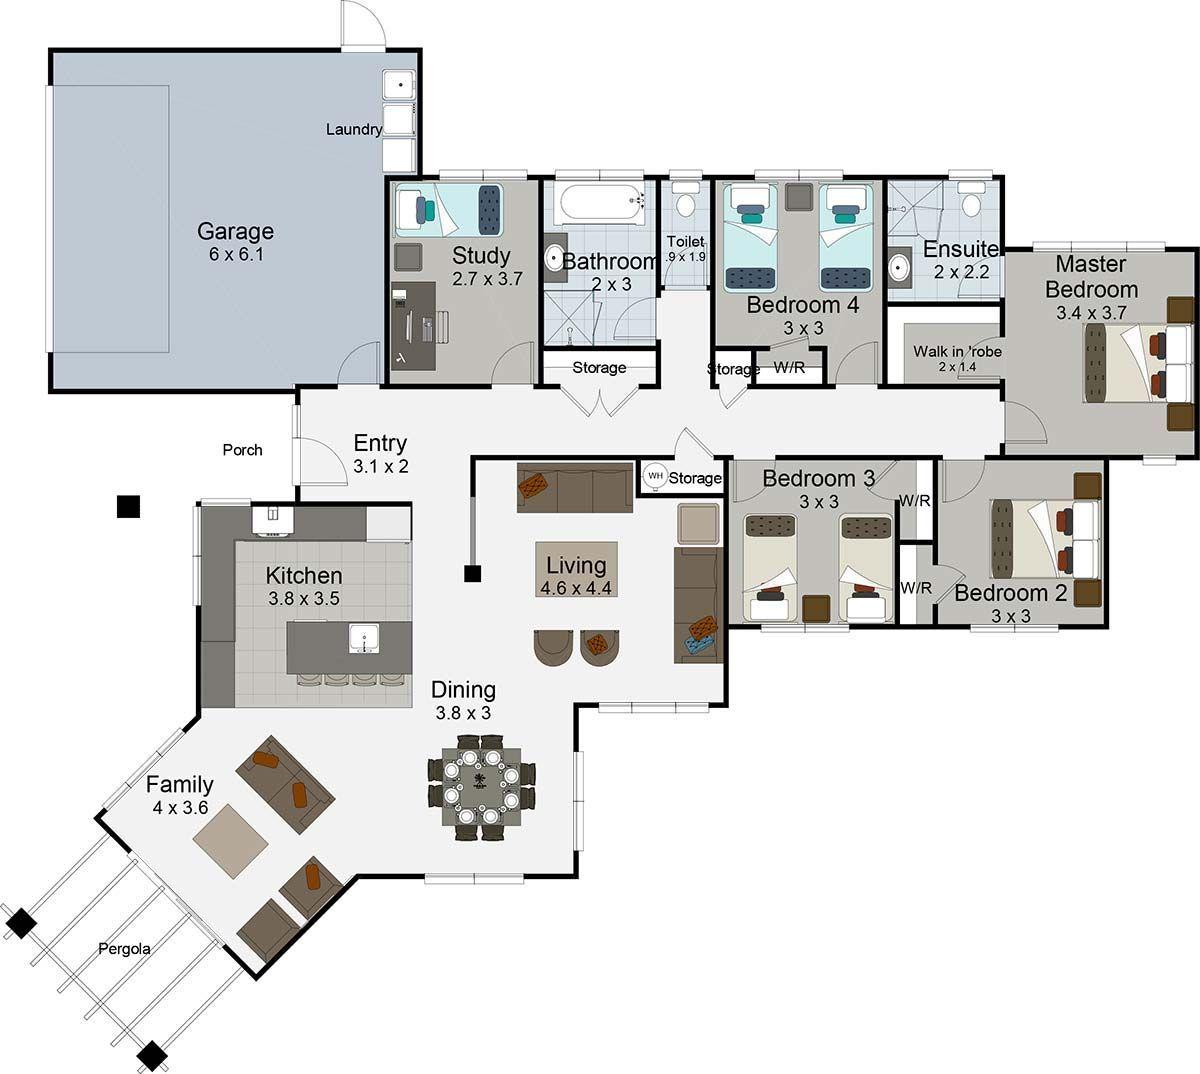 Nz House Plans 4 Bedroom In 2020 Bedroom House Plans 4 Bedroom House Plans Home Design Floor Plans